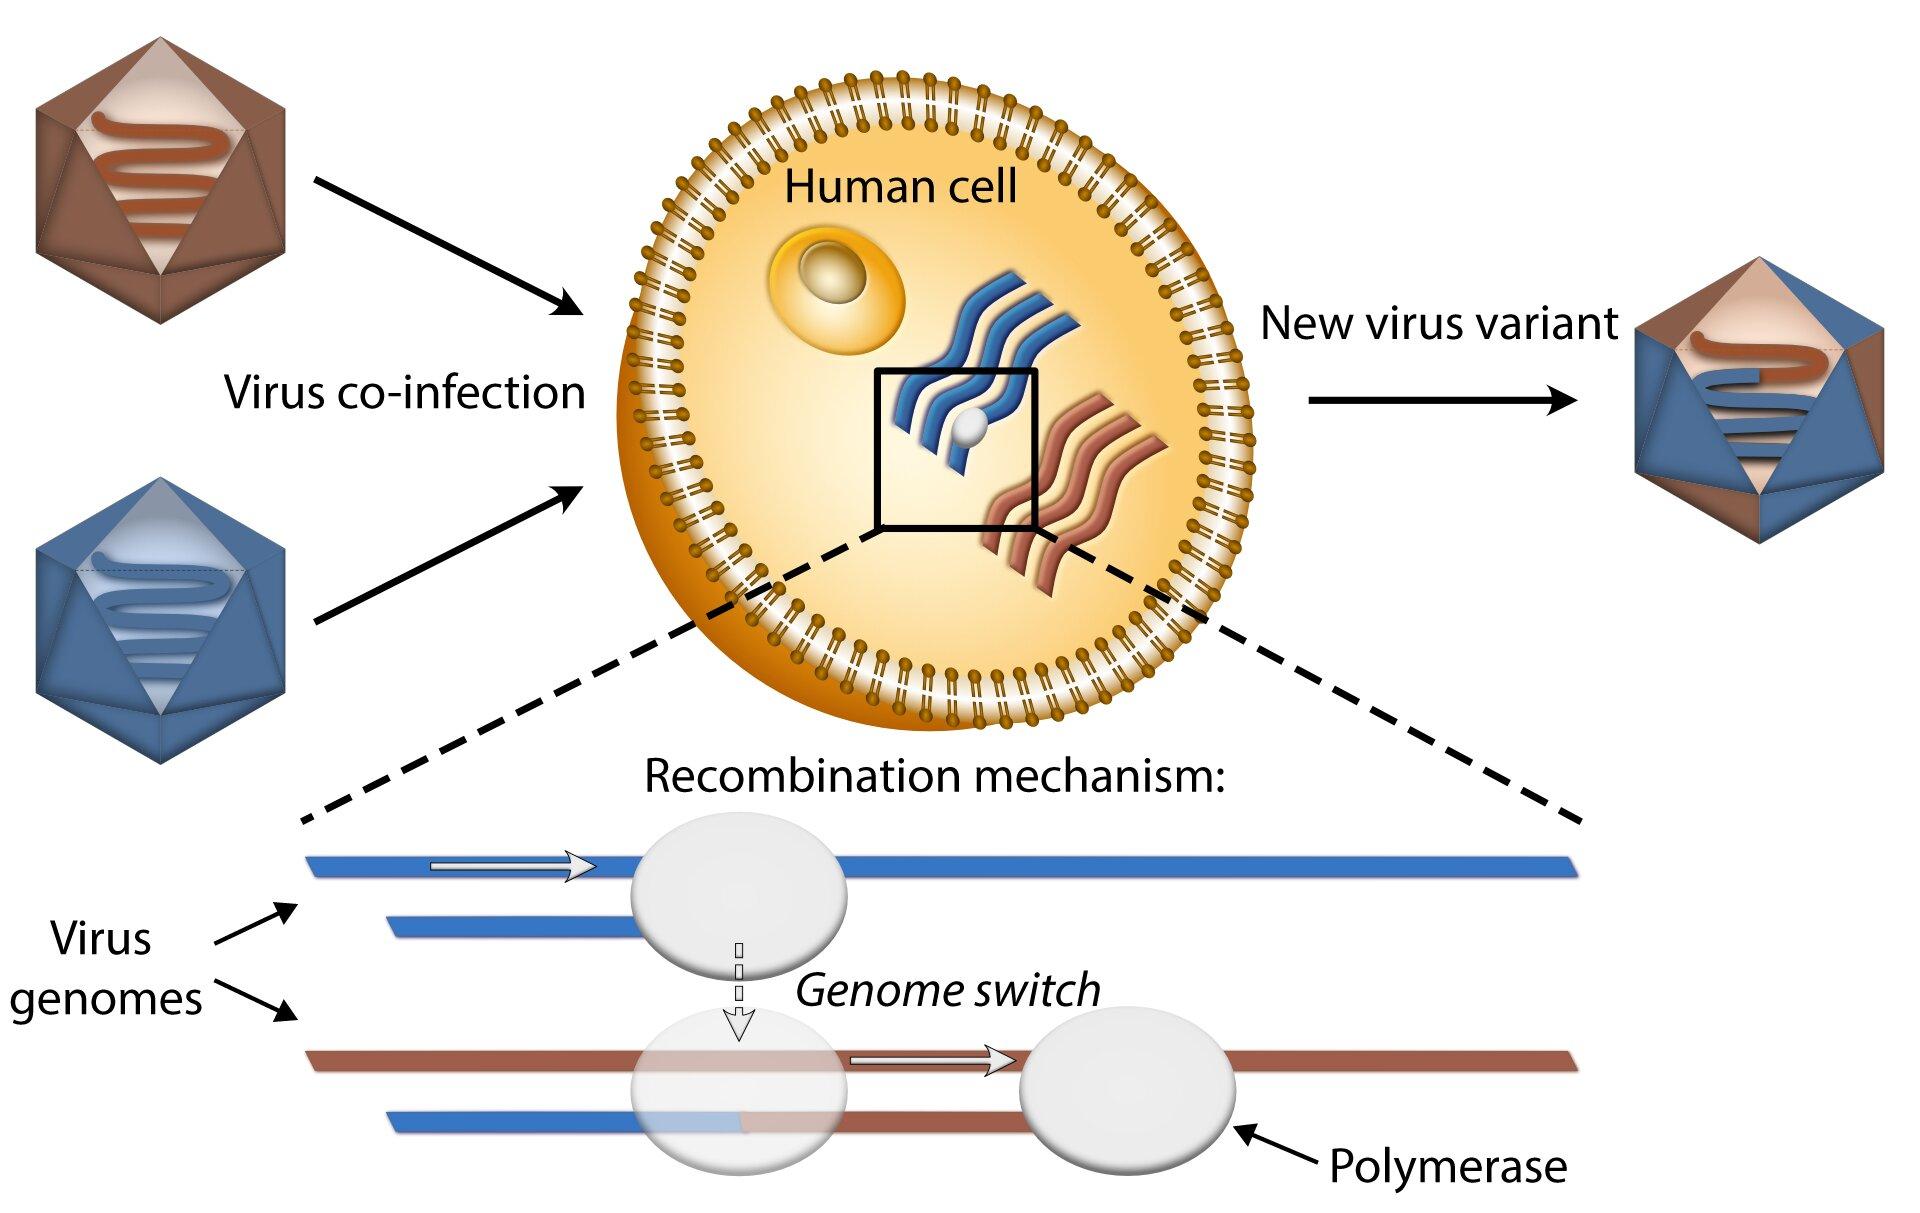 Mechanism Underlying The Emergence Of Virus Variants Unravelled - Todayuknews - Todayuknews